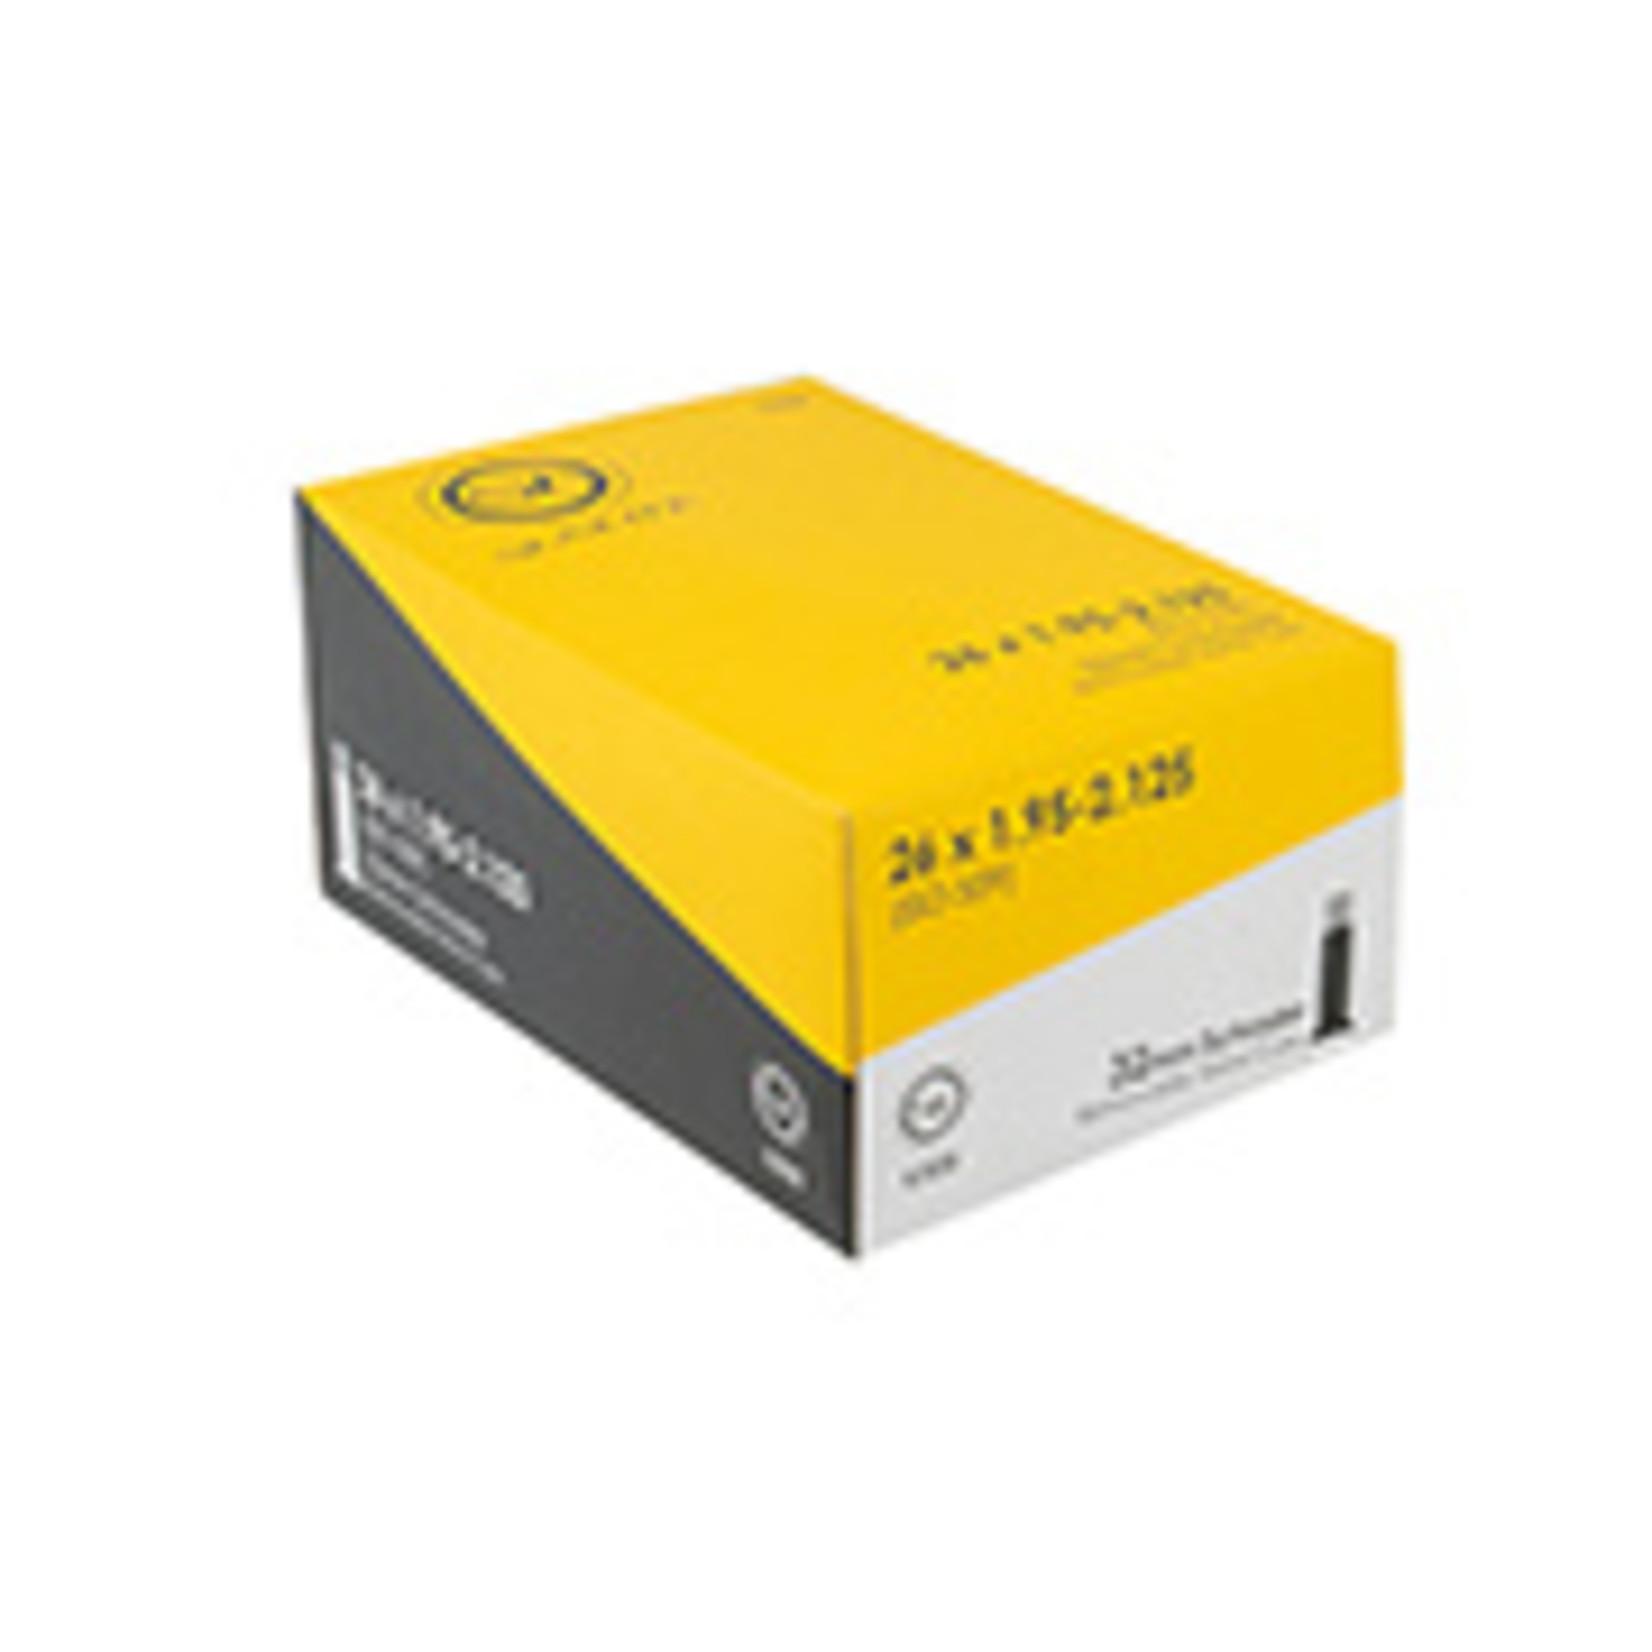 TUBES SUNLT UTILIT 20x1.50-1.95 SV35 FFW39mm